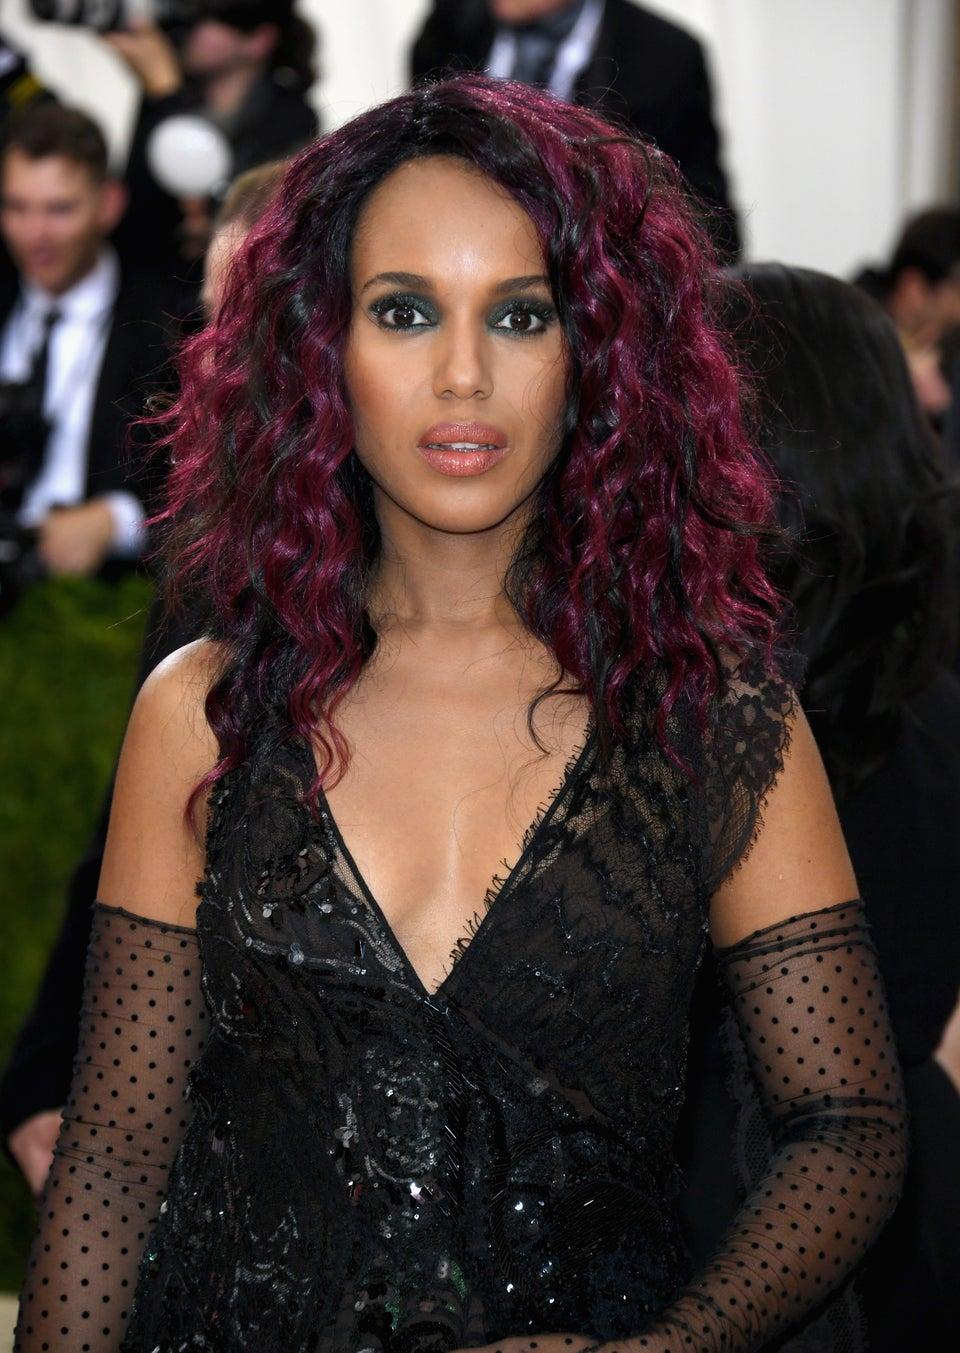 Kerry Washington Hits MET Gala With Purple Hair, Get The Look Now